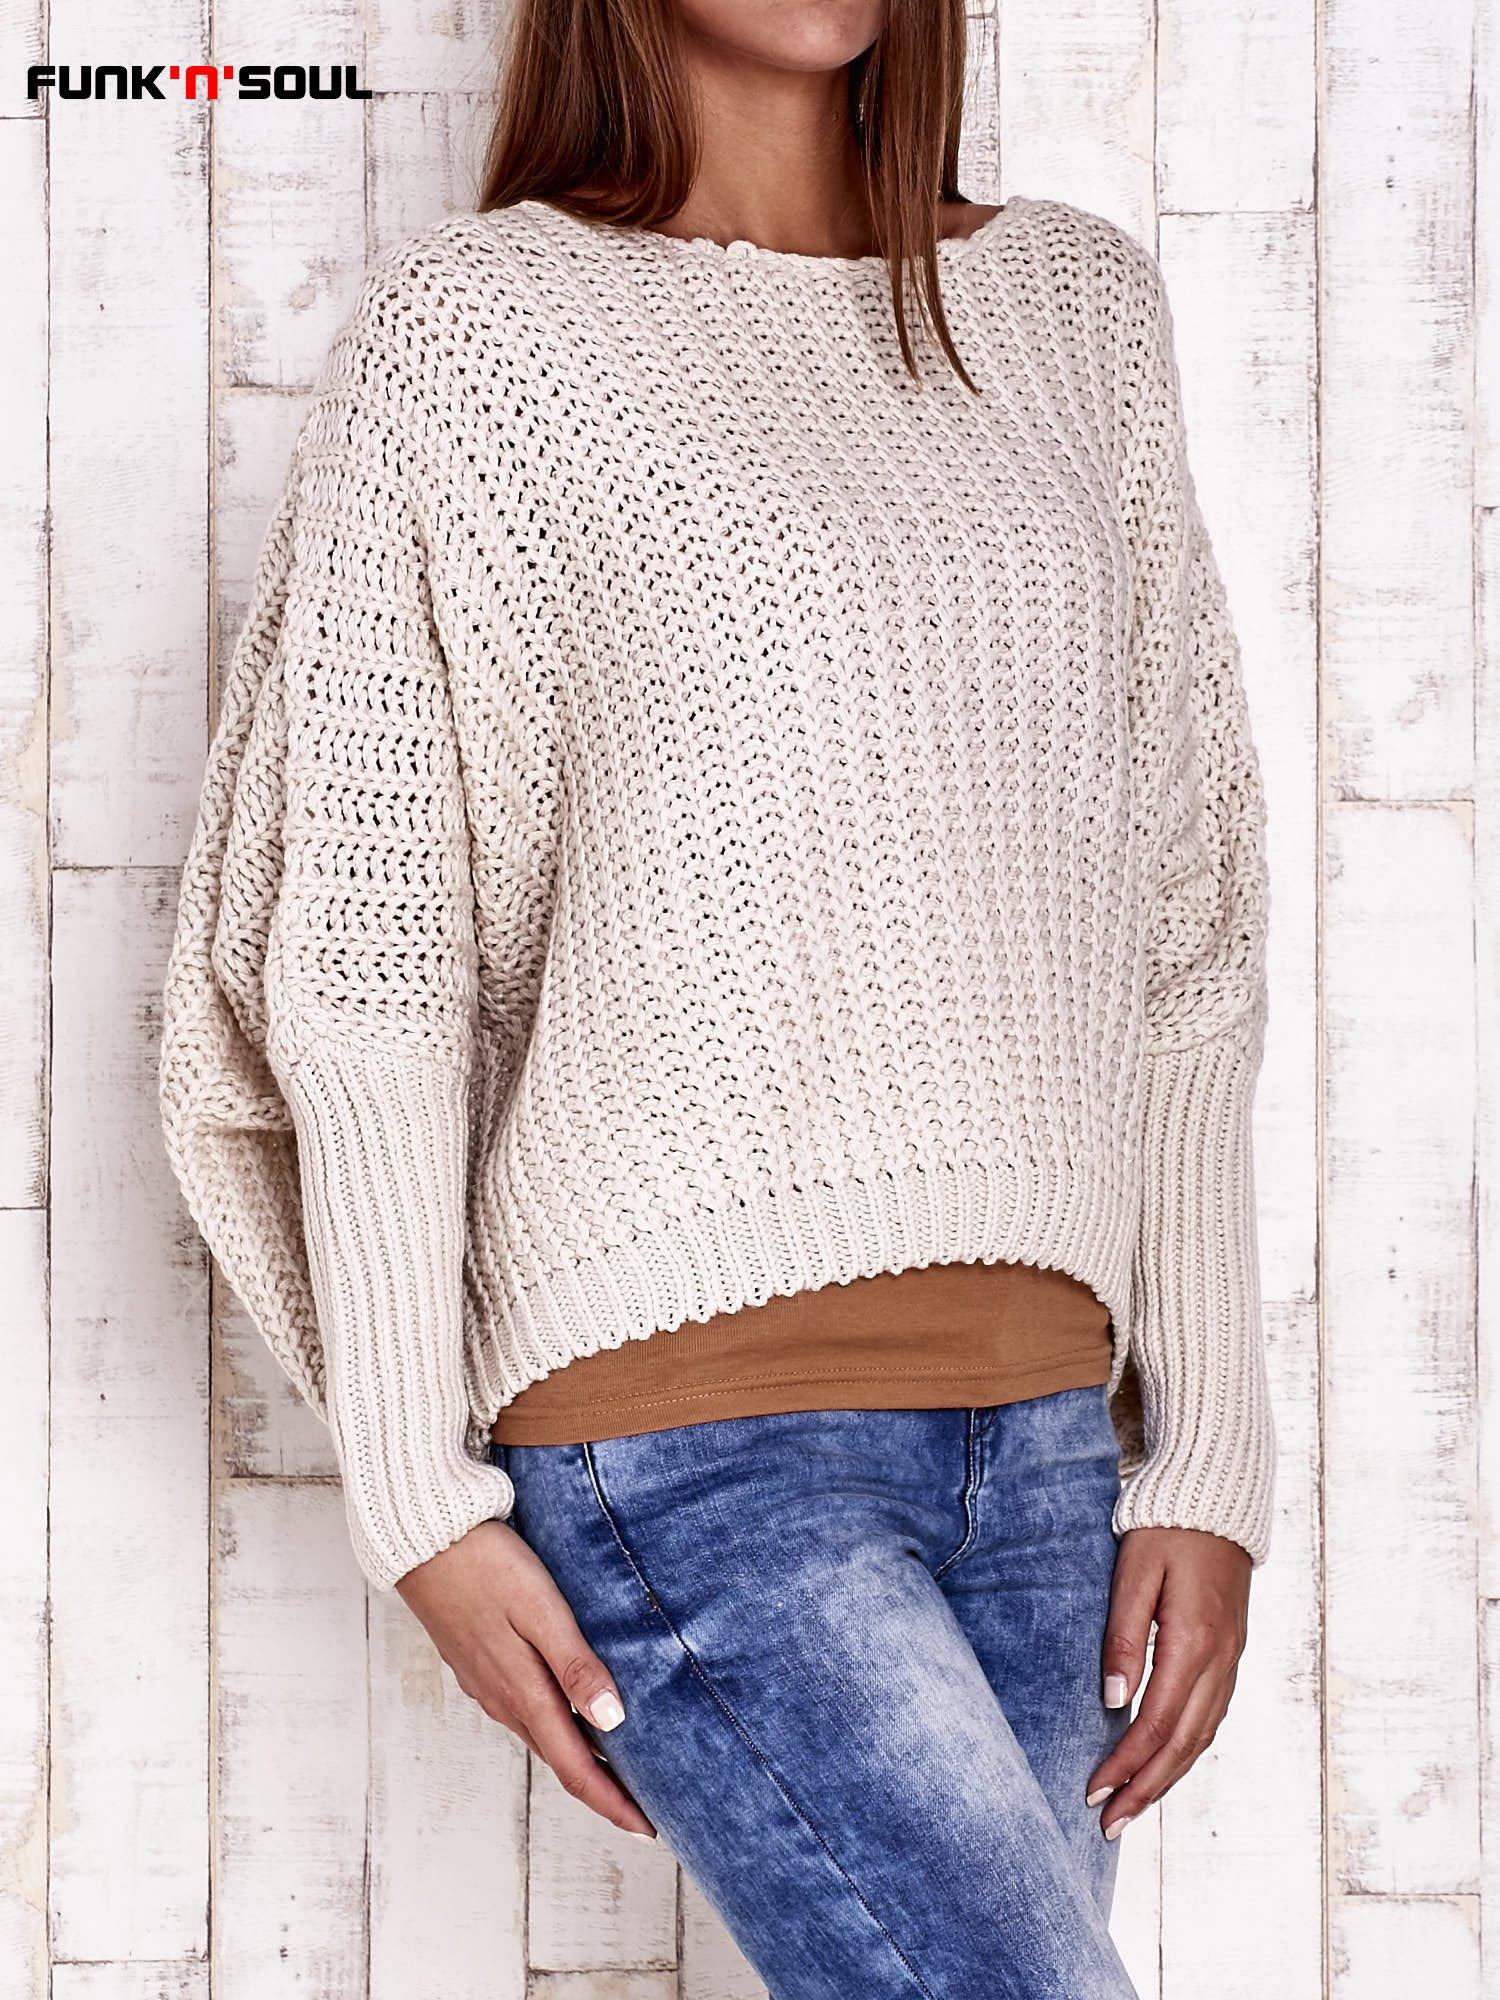 Ecru dziergany sweter oversize FUNK N SOUL                                  zdj.                                  4